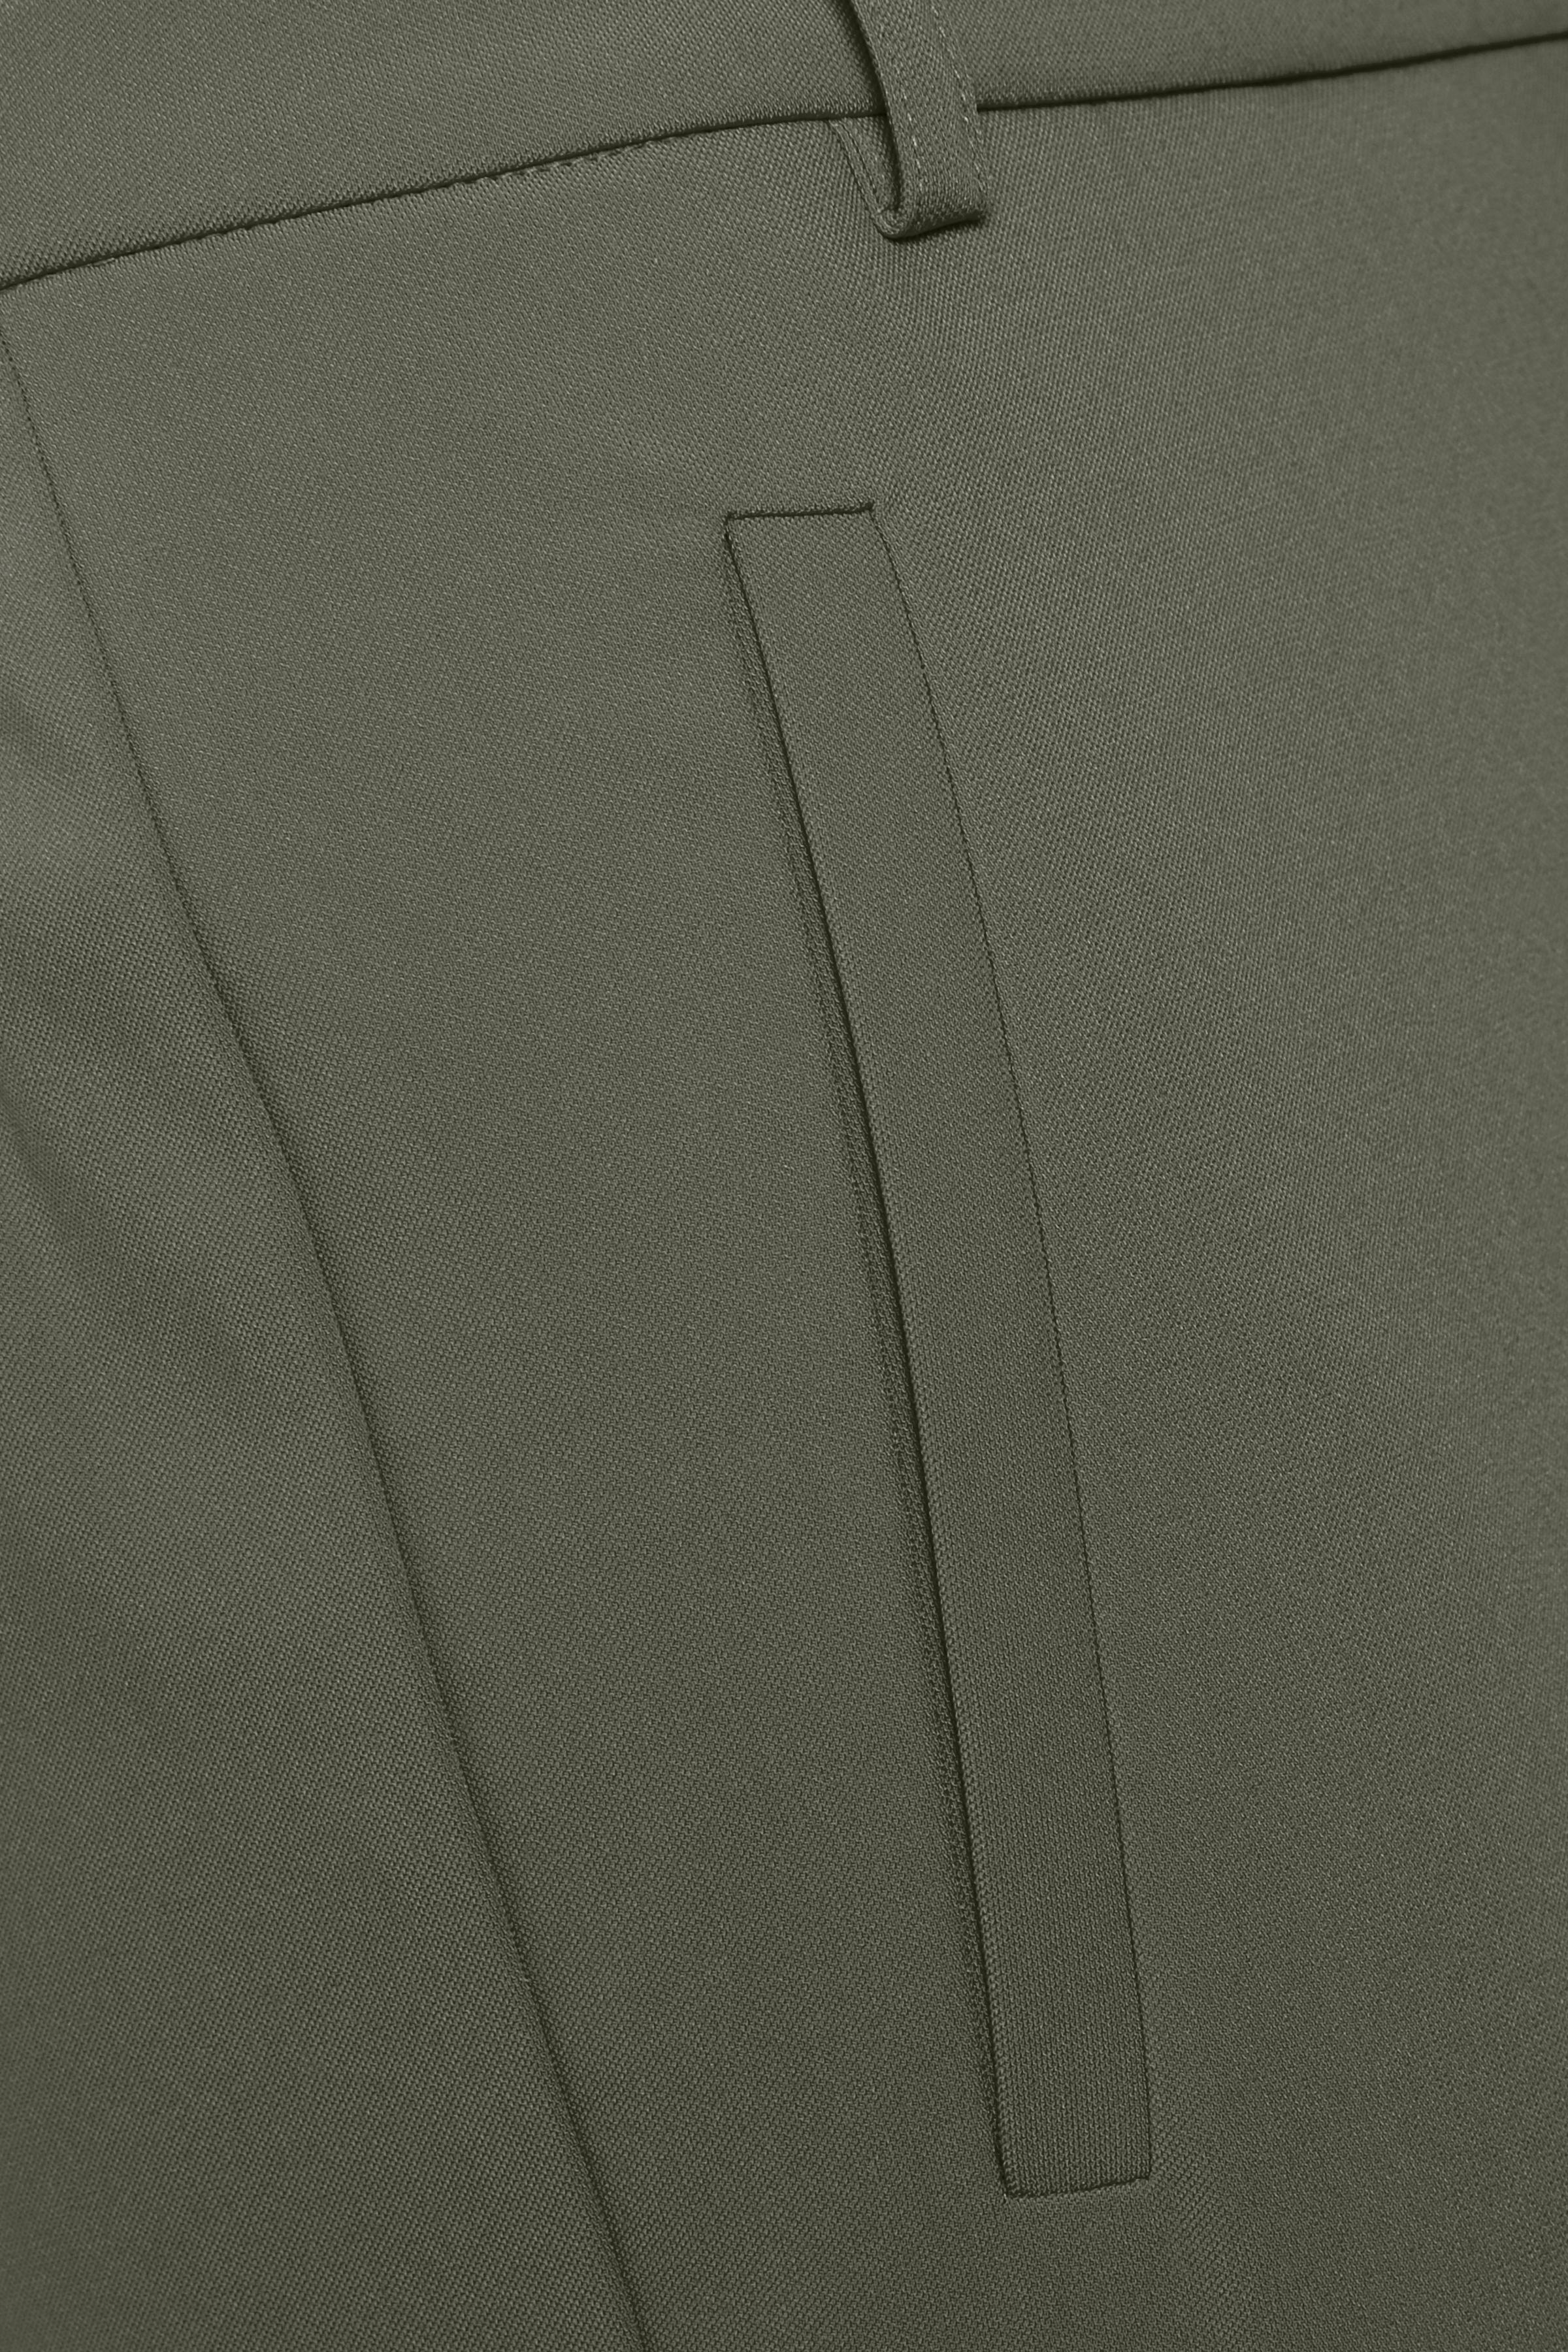 Beetle Green Casual buks – Køb Beetle Green Casual buks fra str. 32-44 her